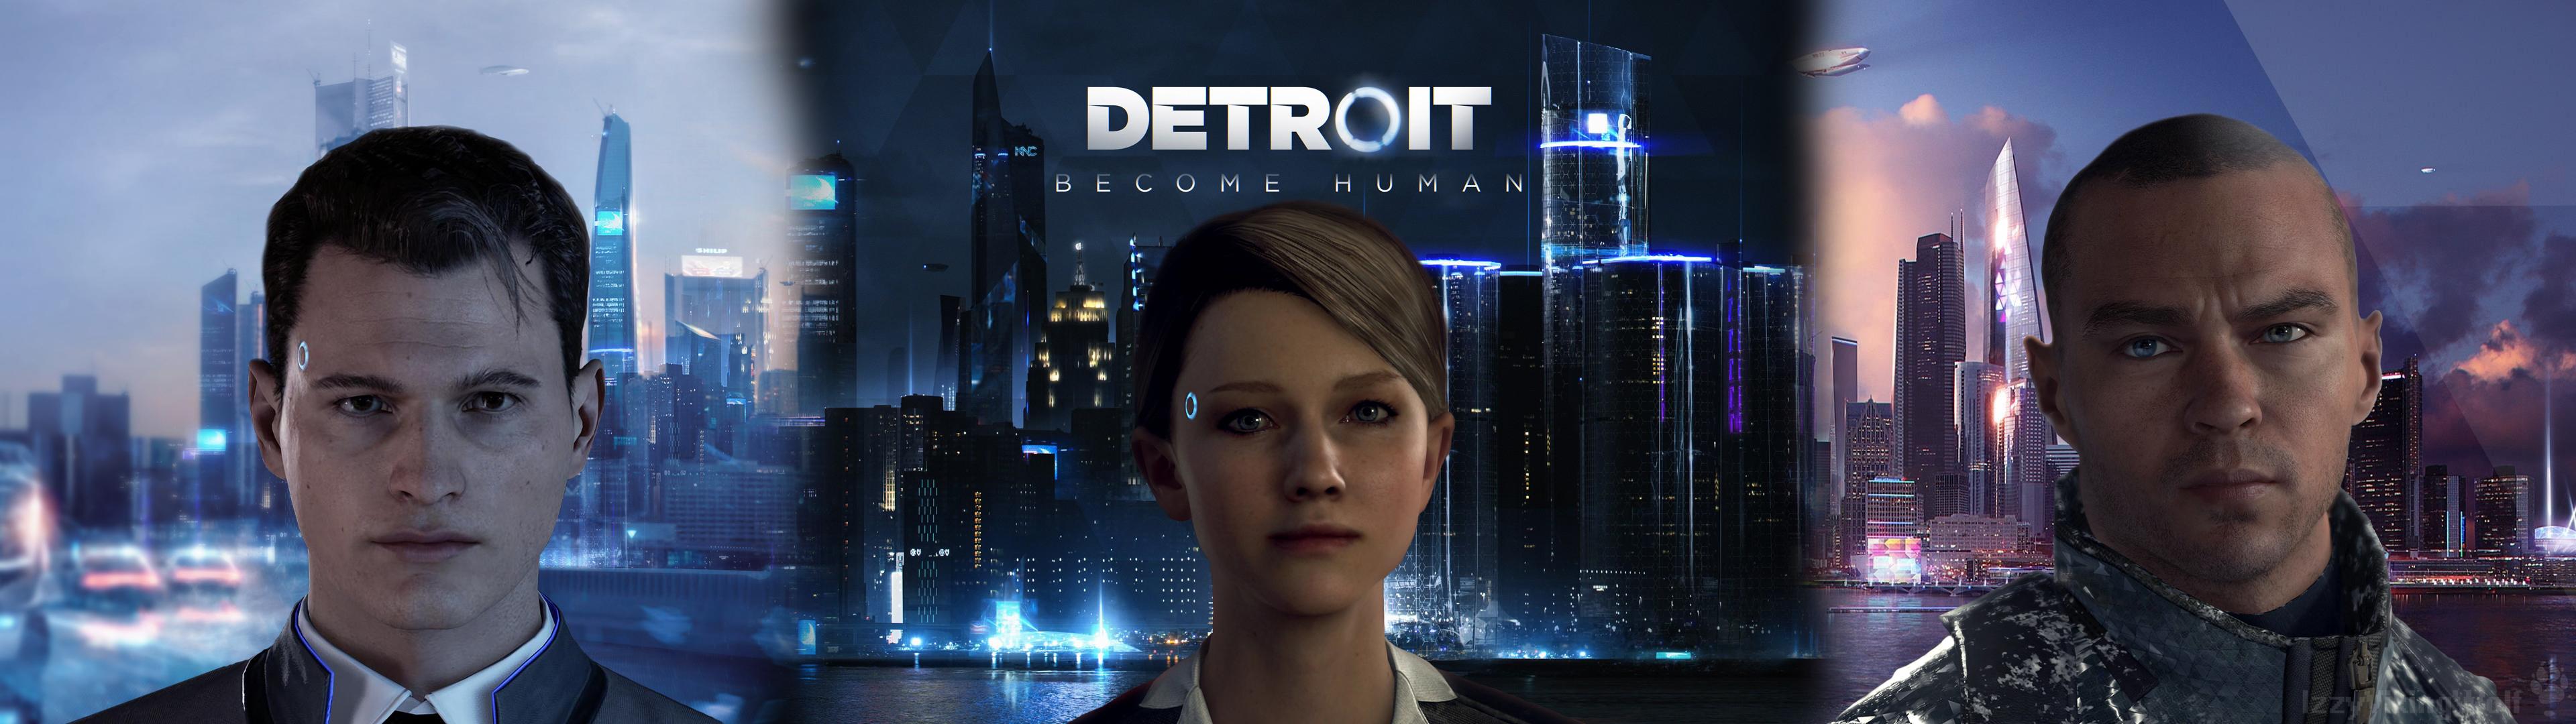 Detroit Become Human Dual Wallpaper By Izzyvikingwolf On Deviantart